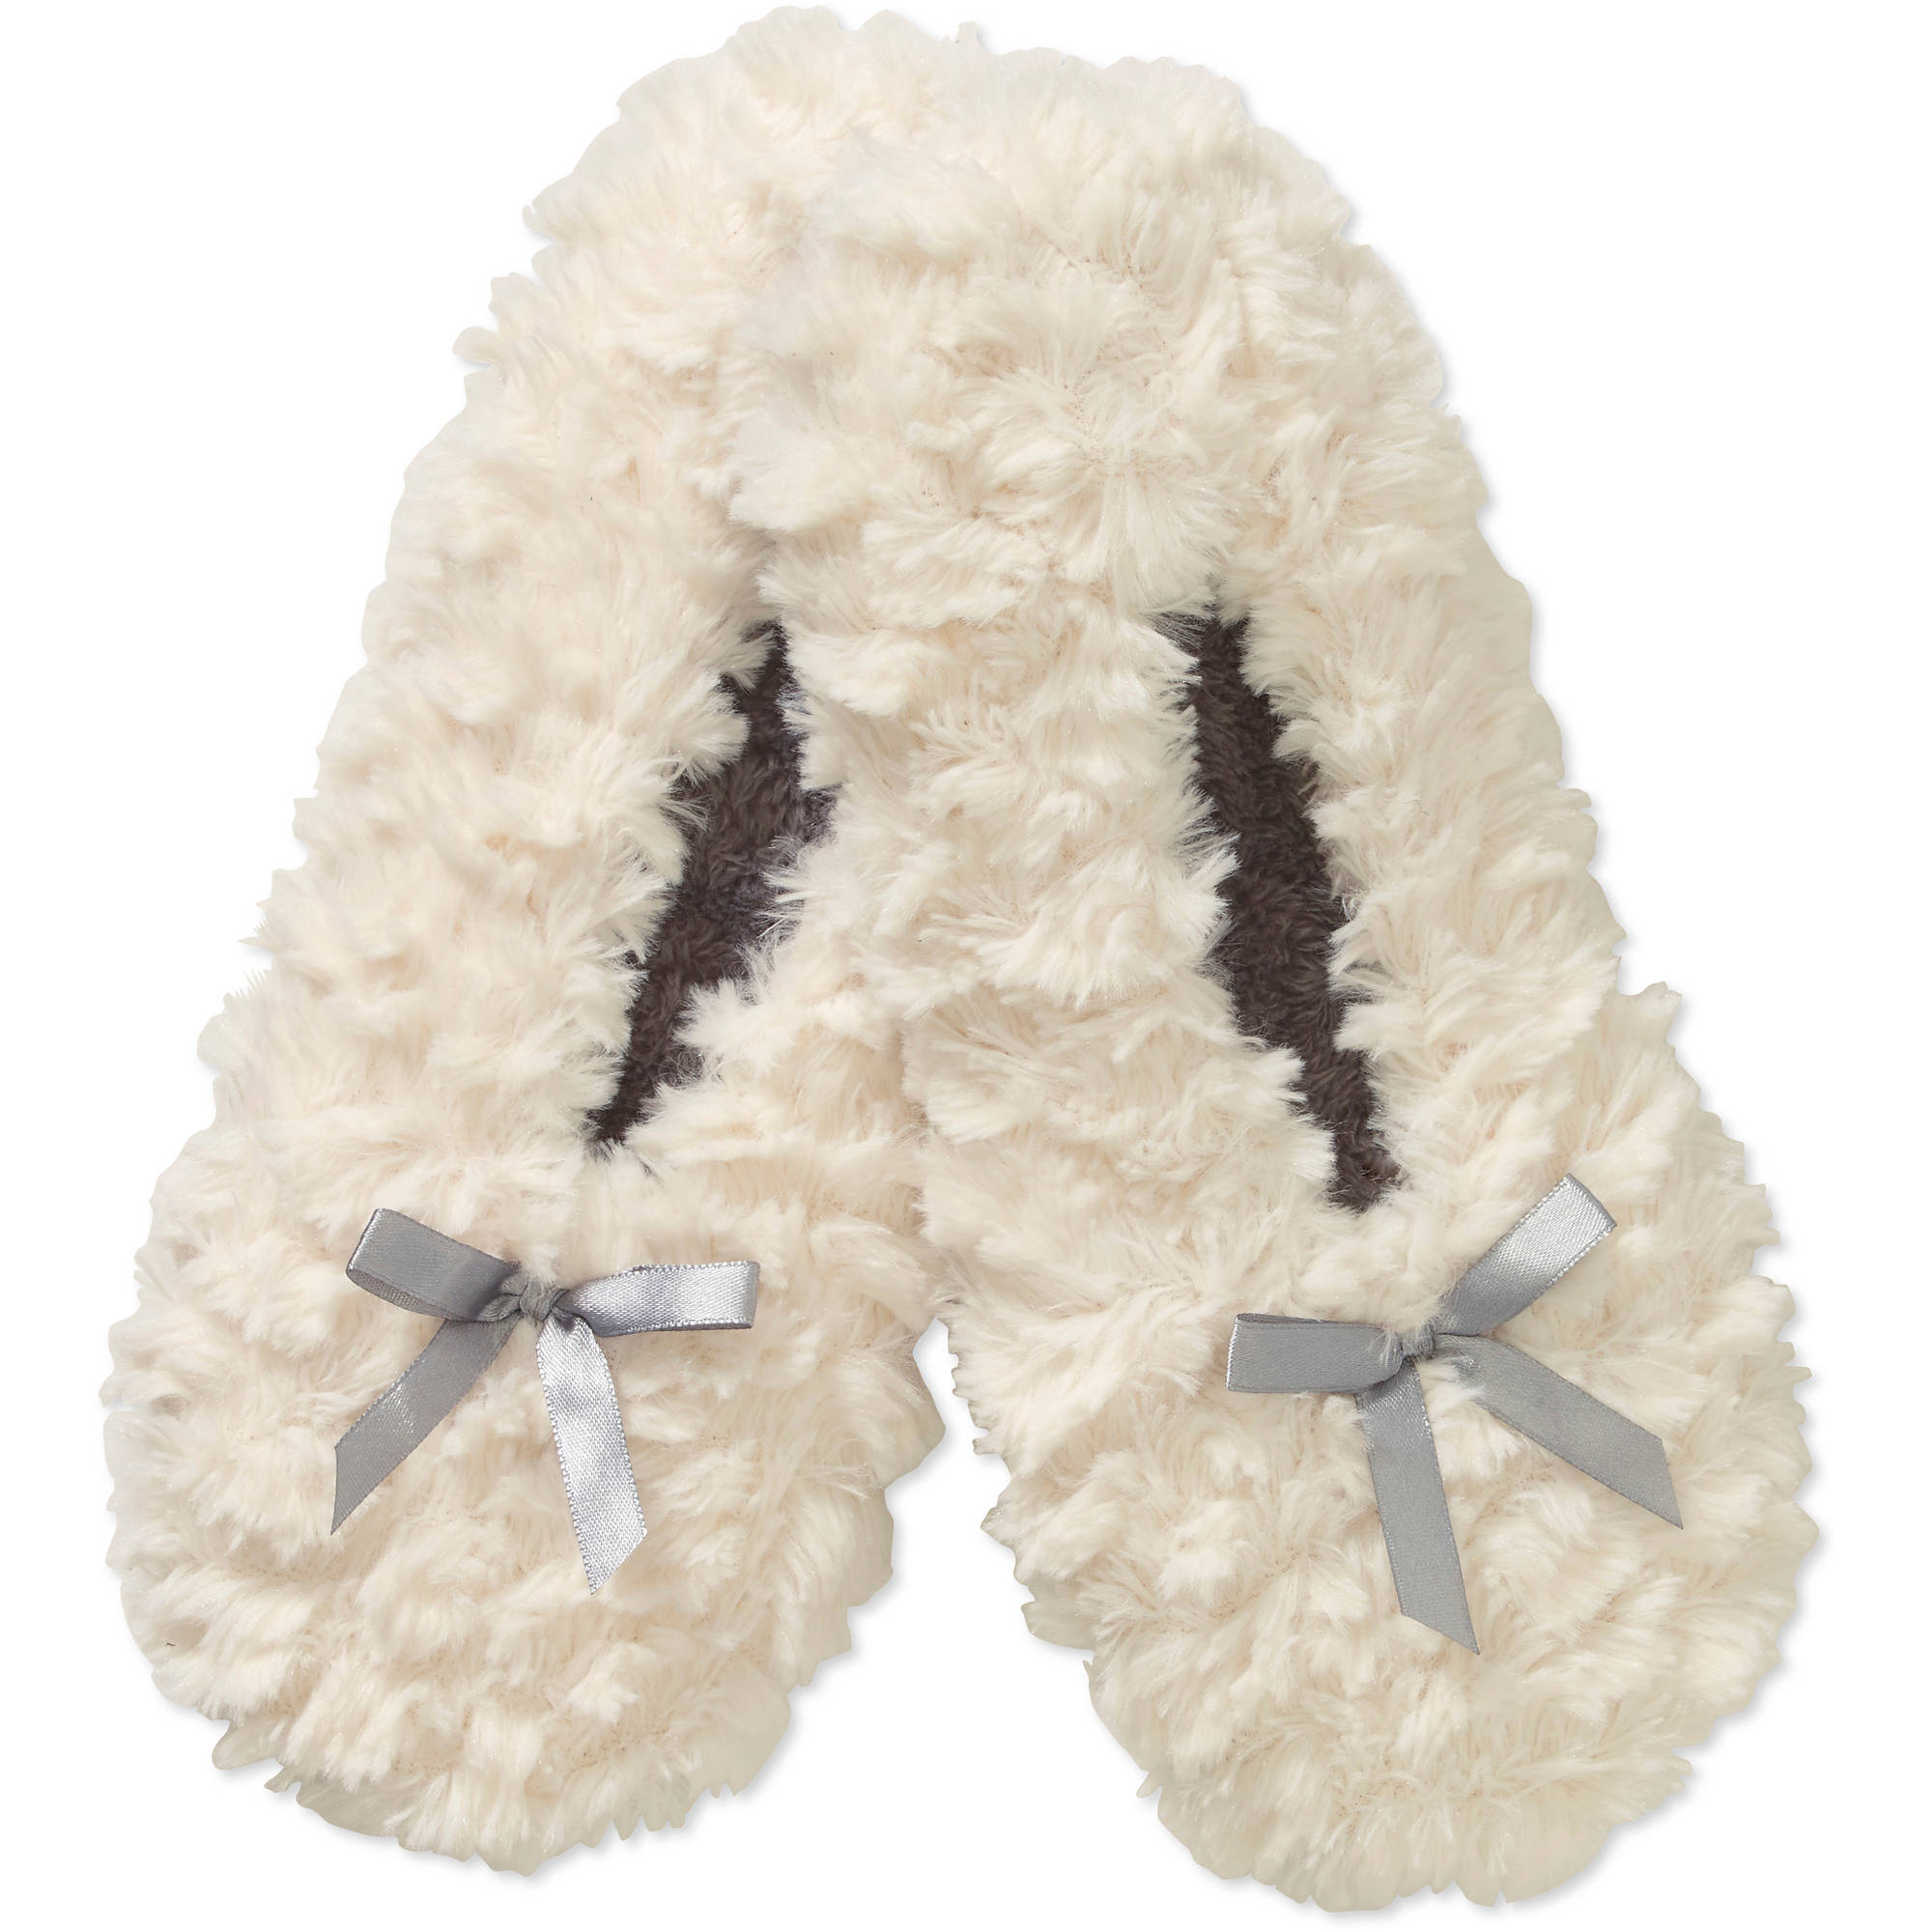 Textured Fur Slipper Socks with Bow